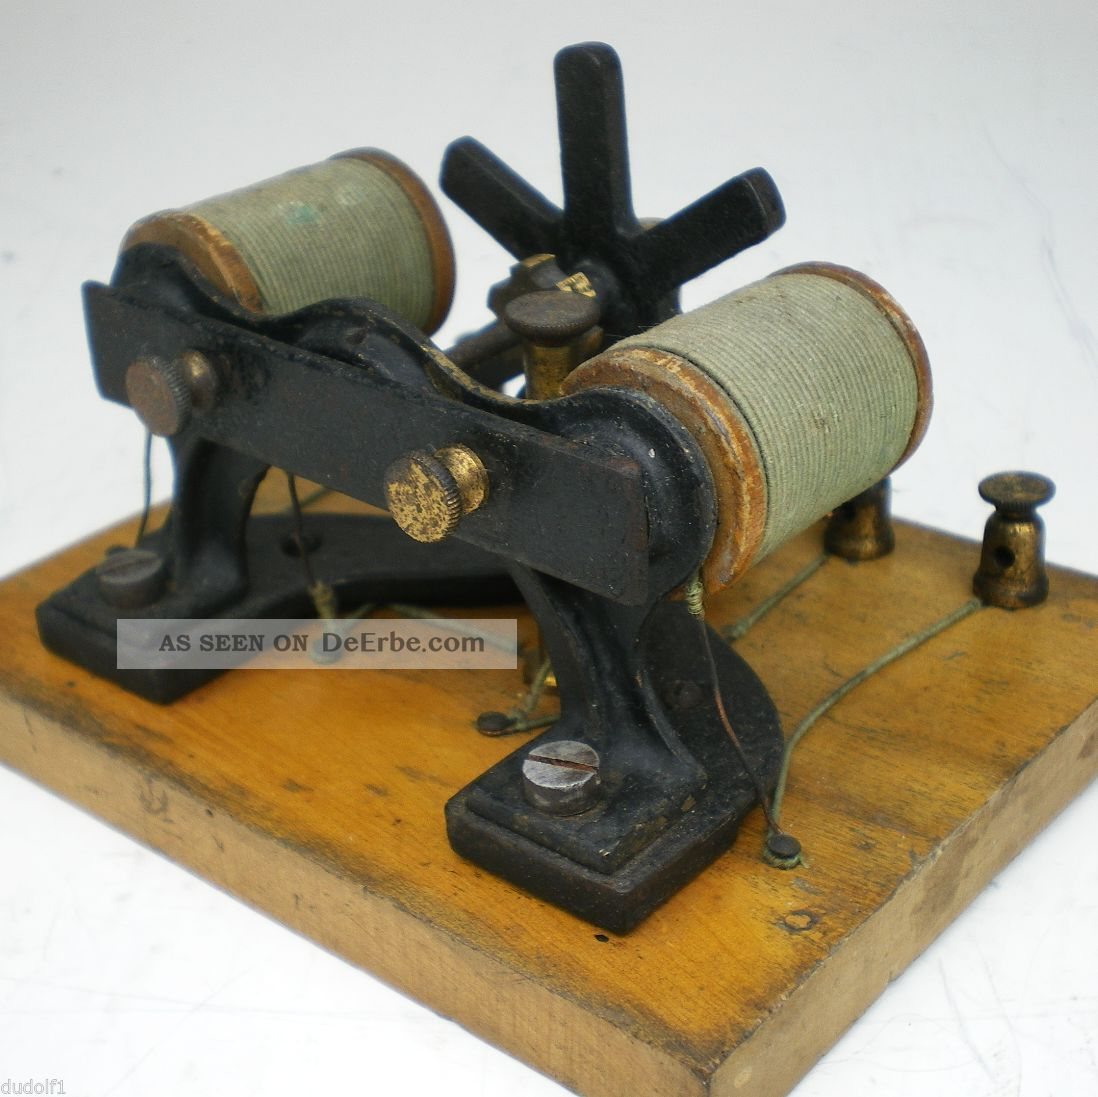 dynamo elektromotor conrad klein spielzeug elektro electric motor n rnberg 1900. Black Bedroom Furniture Sets. Home Design Ideas